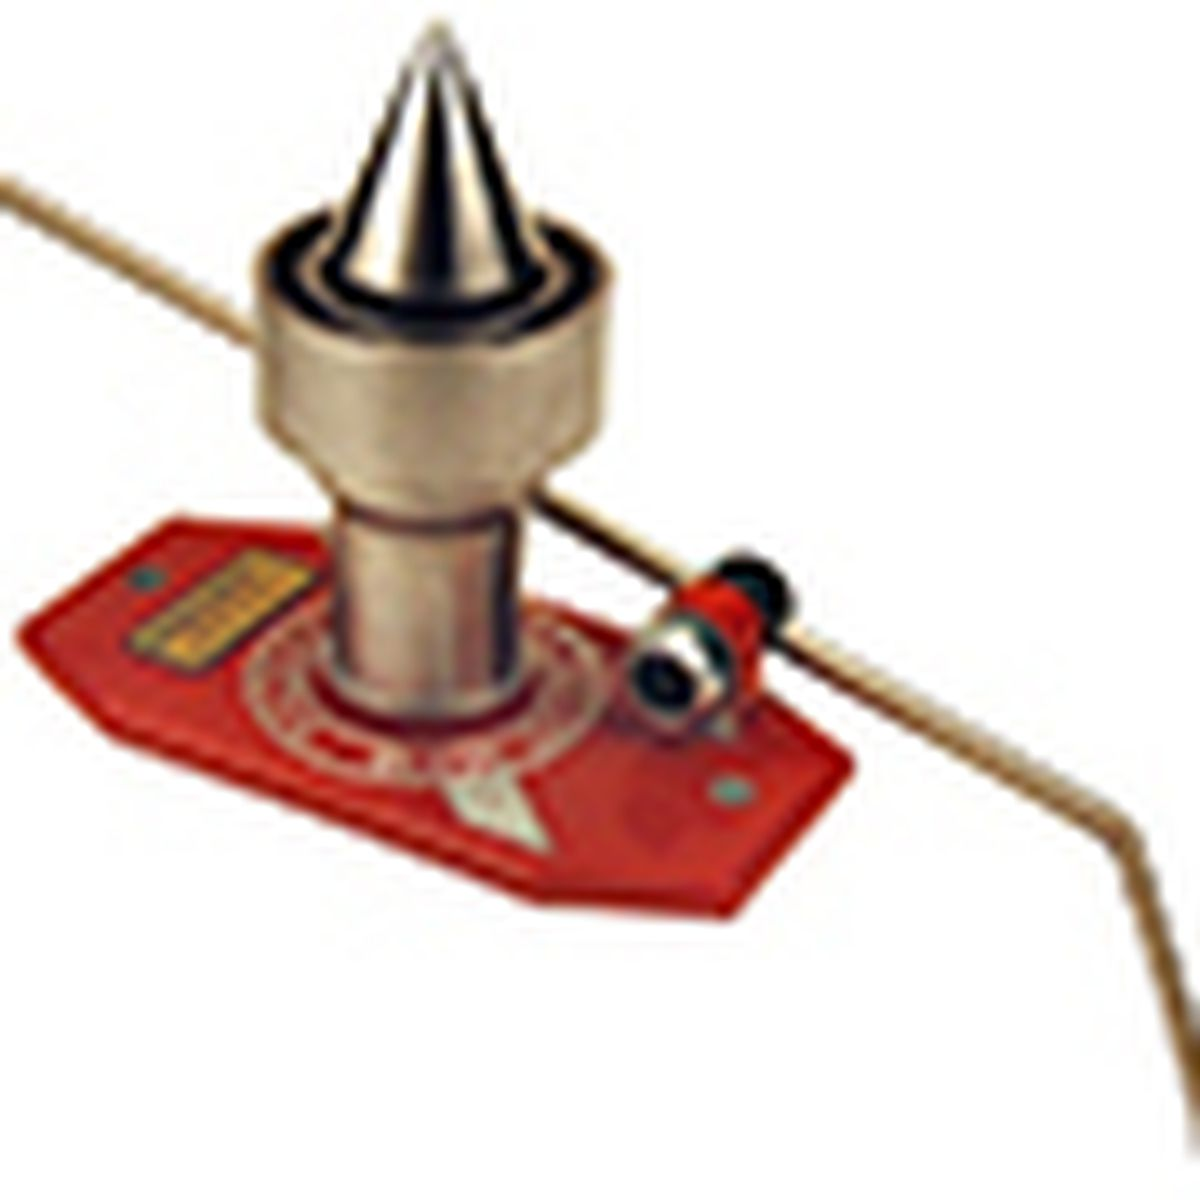 blade balancer for a lawn mower blade